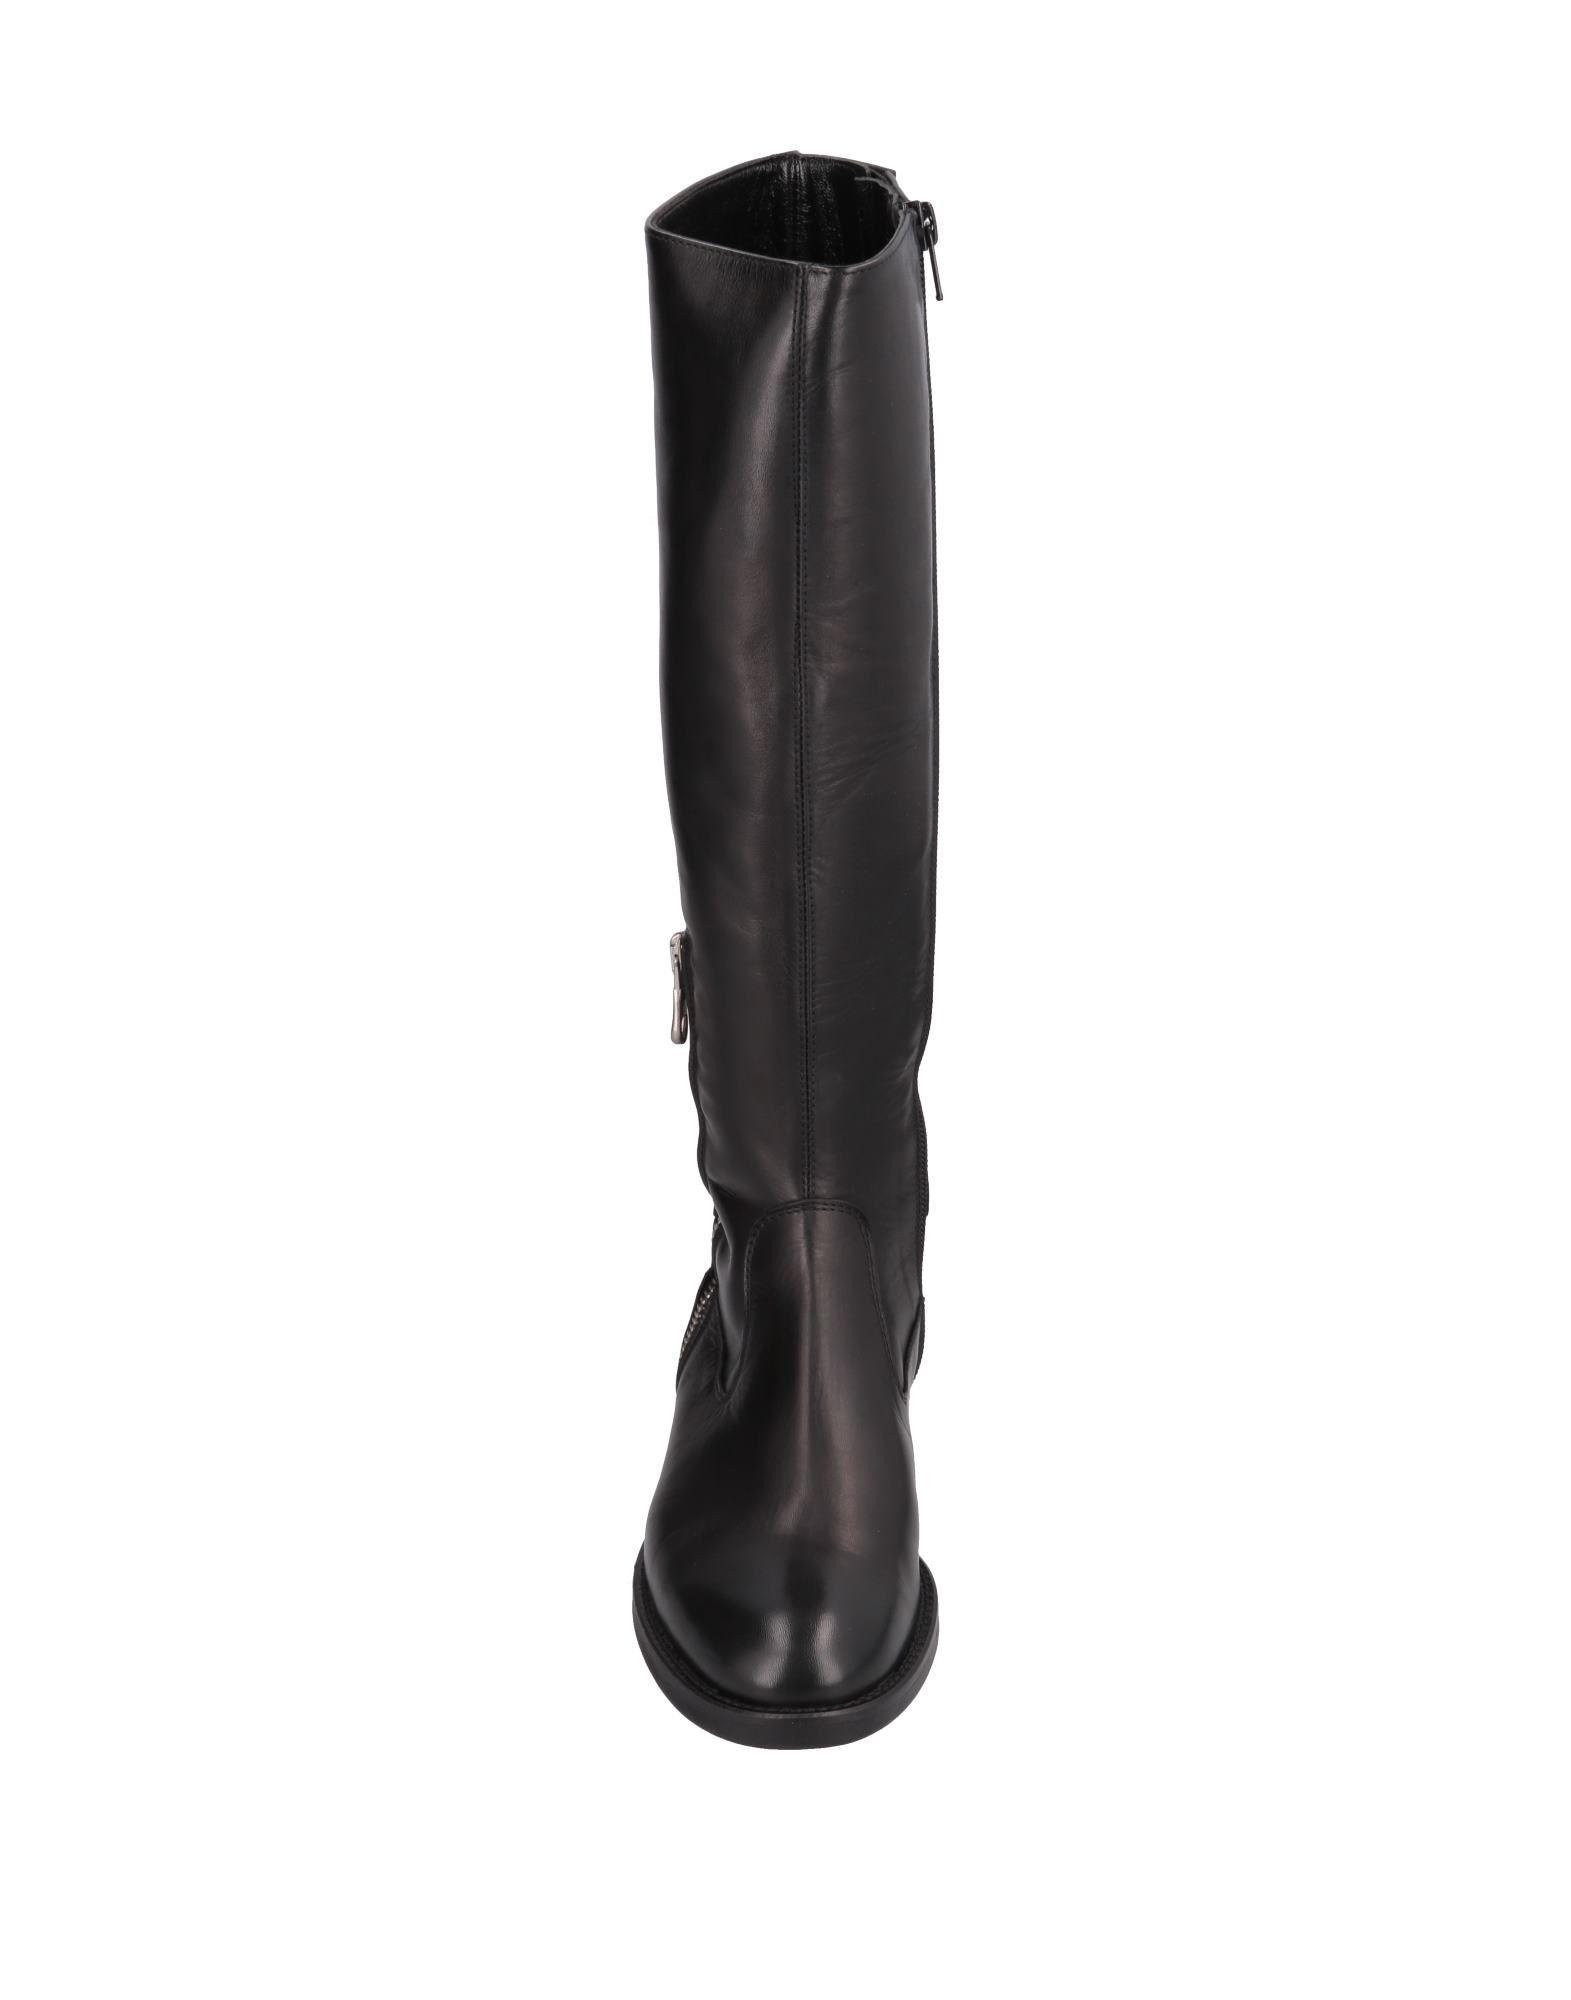 Stilvolle billige Schuhe Damen Merygen Stiefel Damen Schuhe  11521009GH da3561